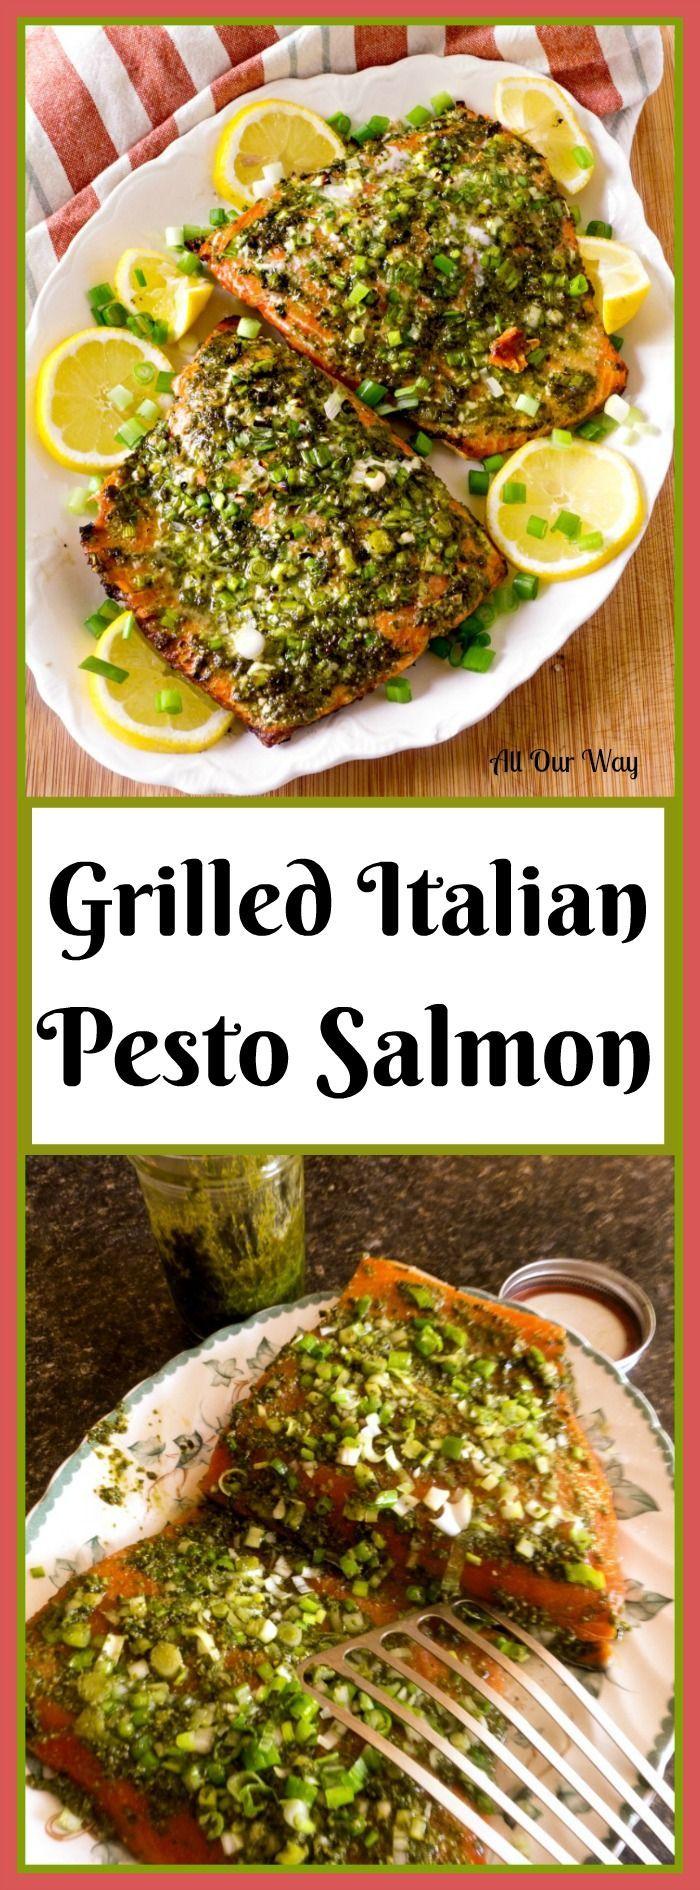 Grilled Italian Pesto Salmon a quick and delicious dish ready in 30 minutes @allourway.com